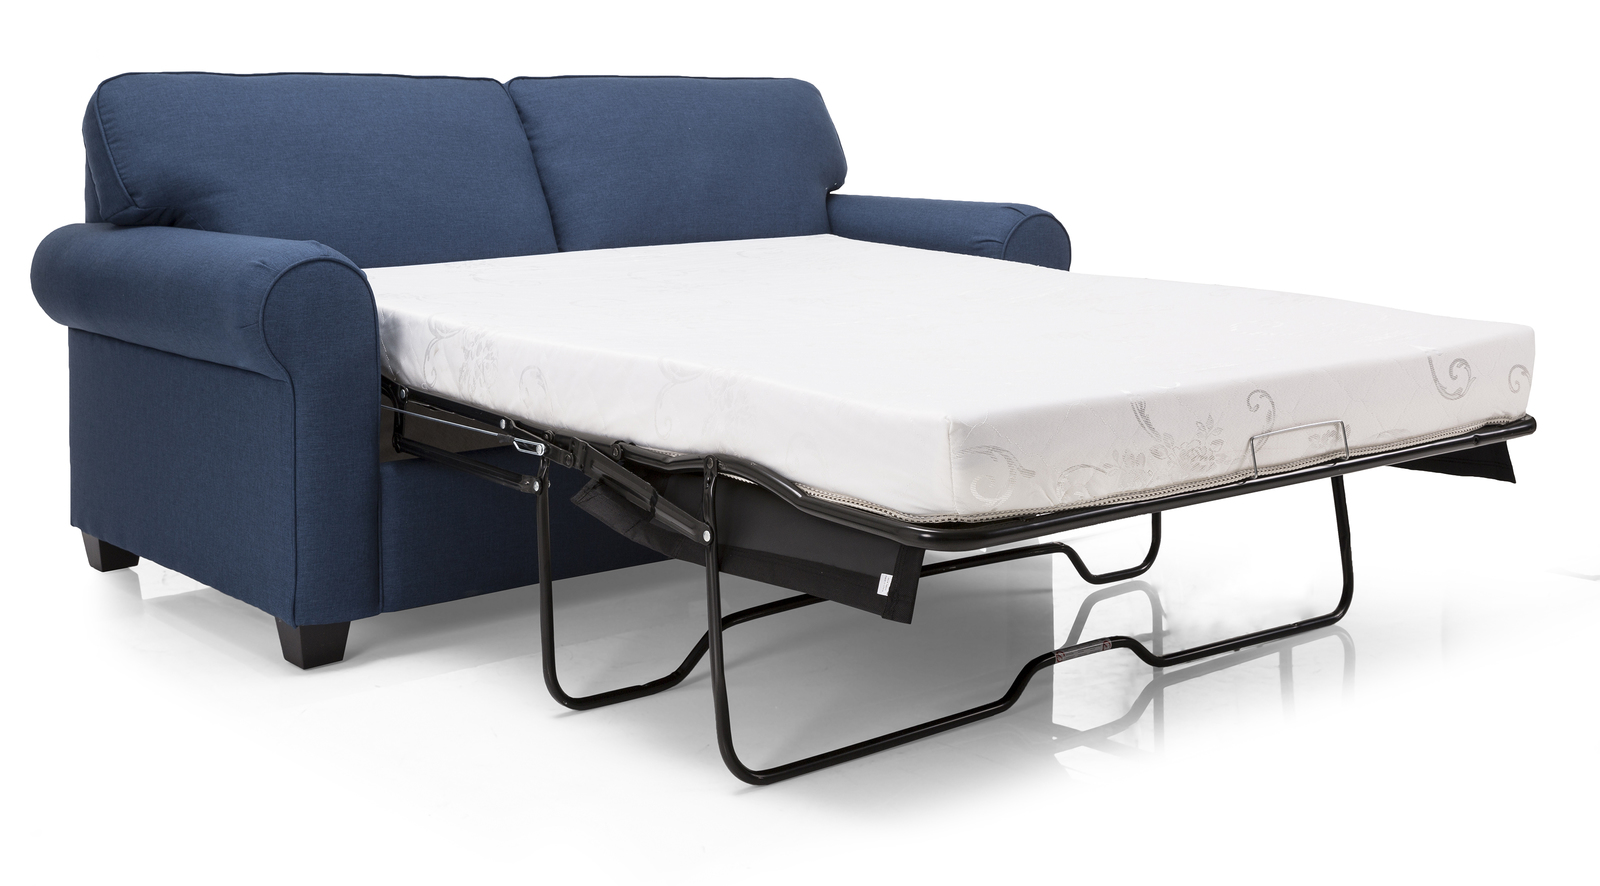 Enjoyable 2179 Double Sofa Bed Sleeper Decor Rest Furniture Ltd Evergreenethics Interior Chair Design Evergreenethicsorg